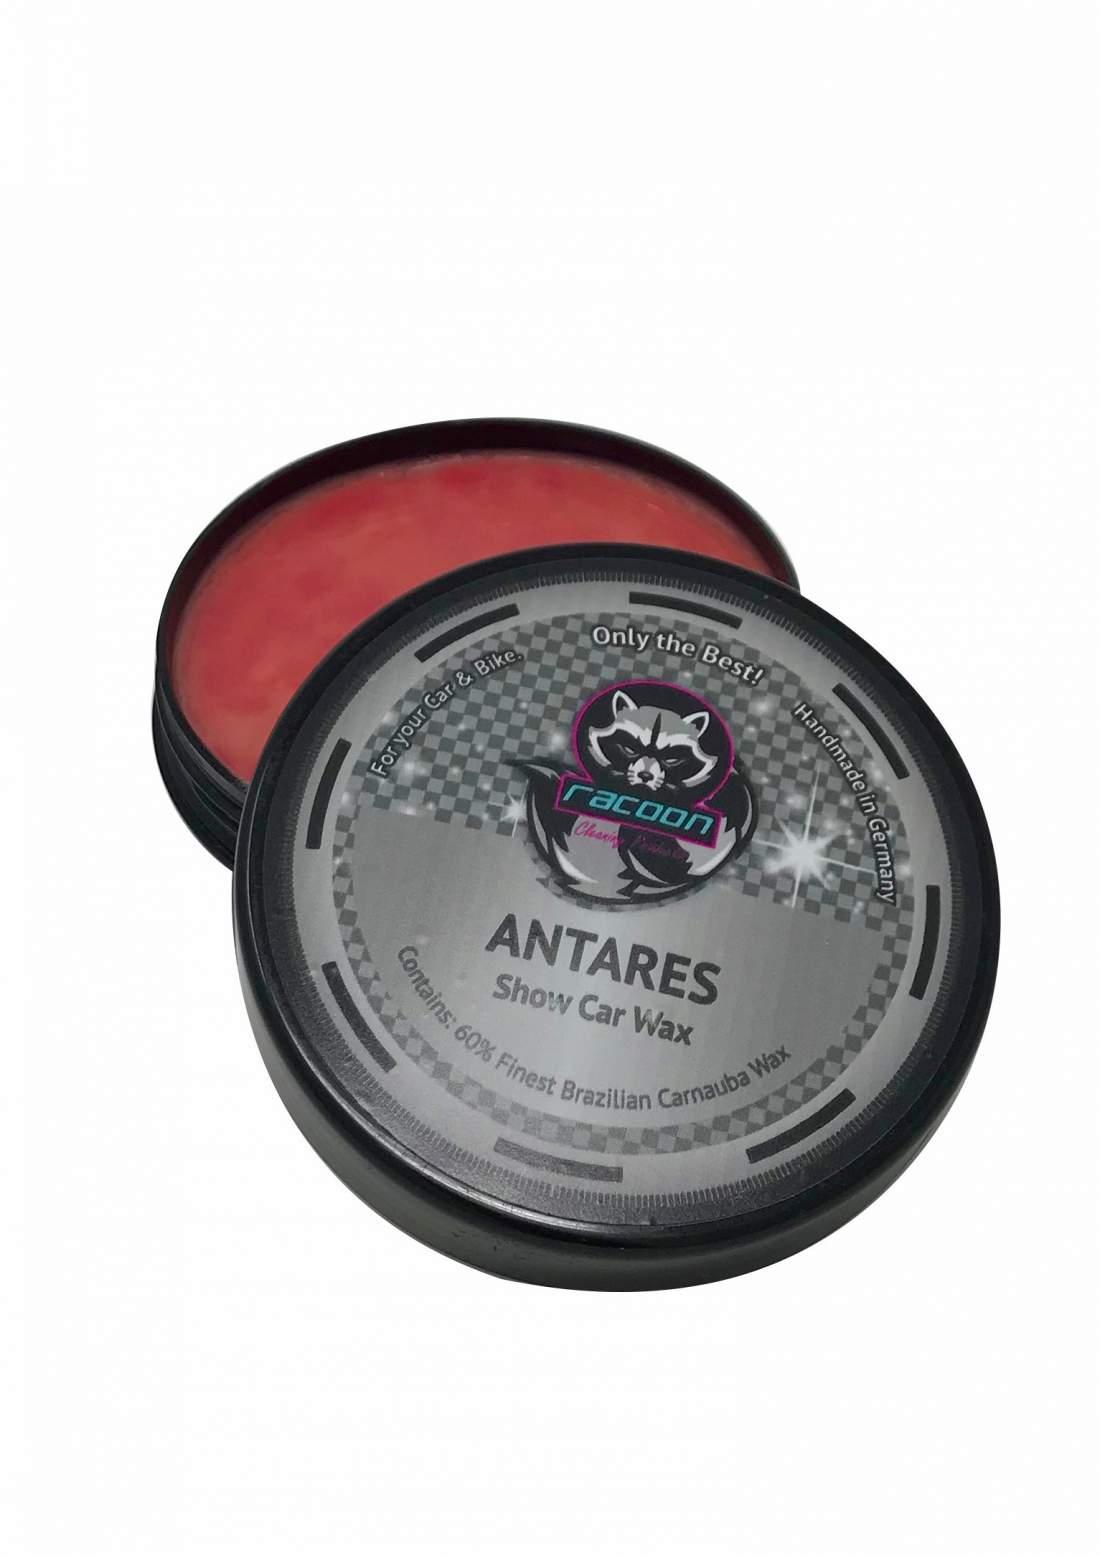 ANTARES - Racoon Show Car Wax  (új)